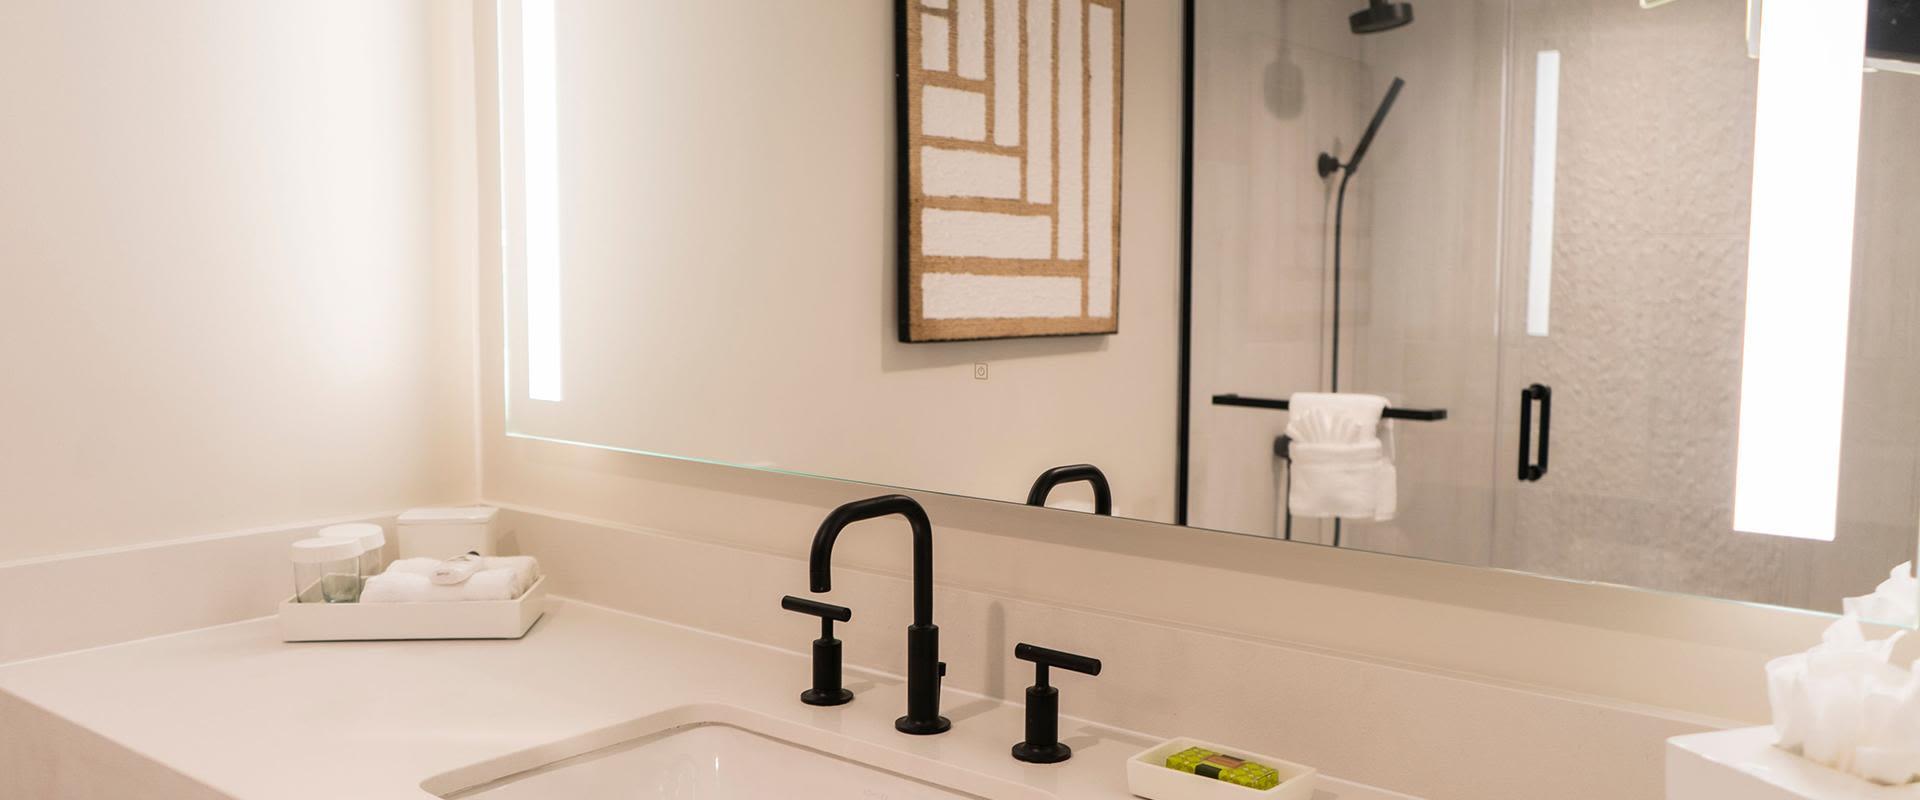 San Juan Resort Guest Room Bathroom